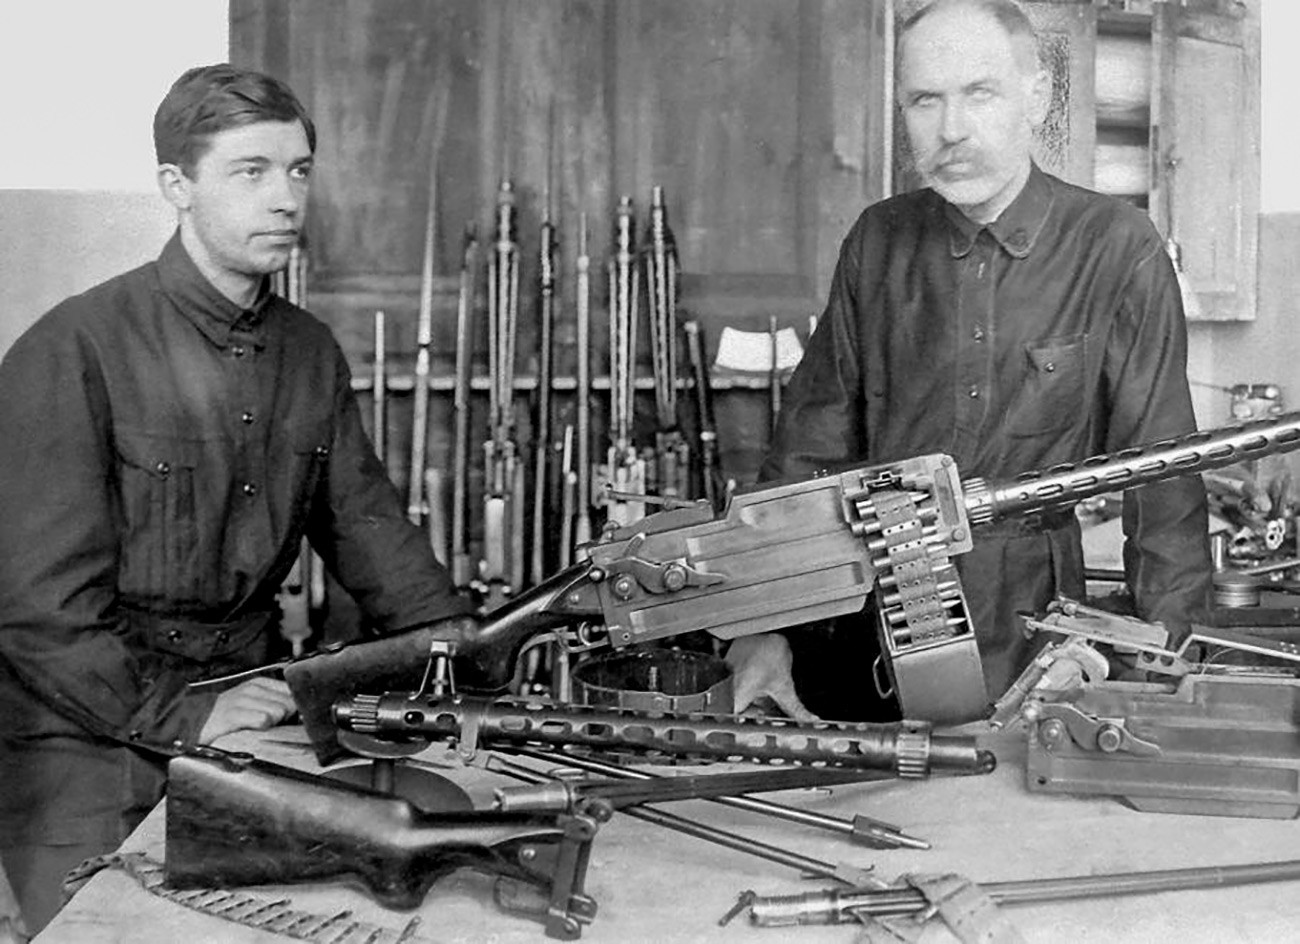 Fiodor Tokarev et son fils avec la mitrailleuse Maxim-Tokarev modèle 1925